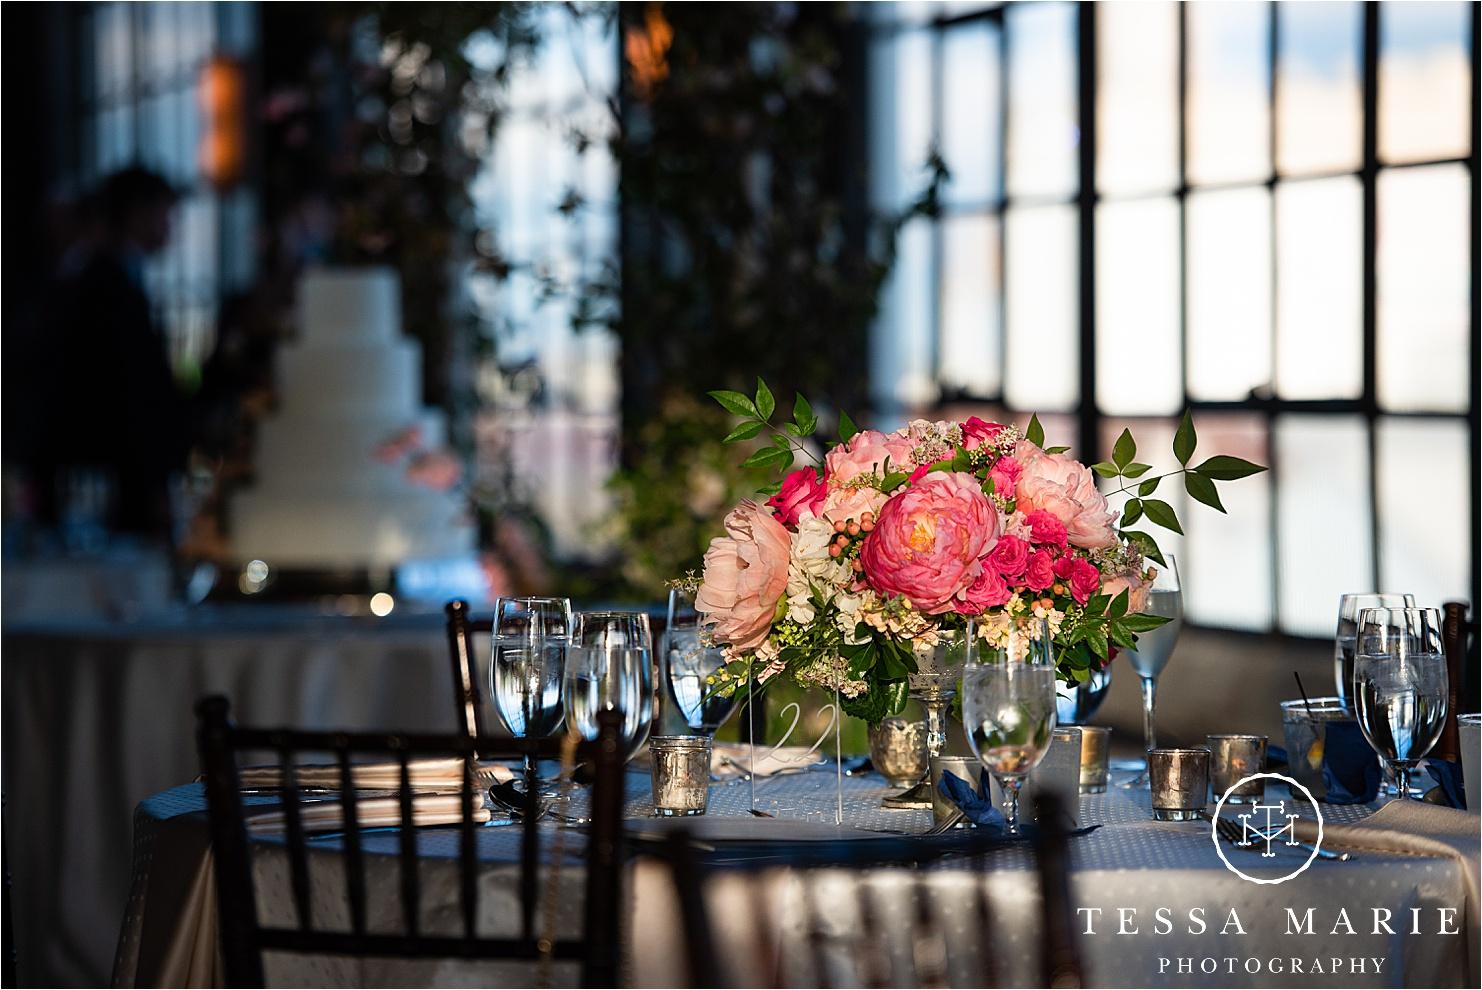 Tessa_marie_weddings_houston_wedding_photographer_The_astorian_0143.jpg